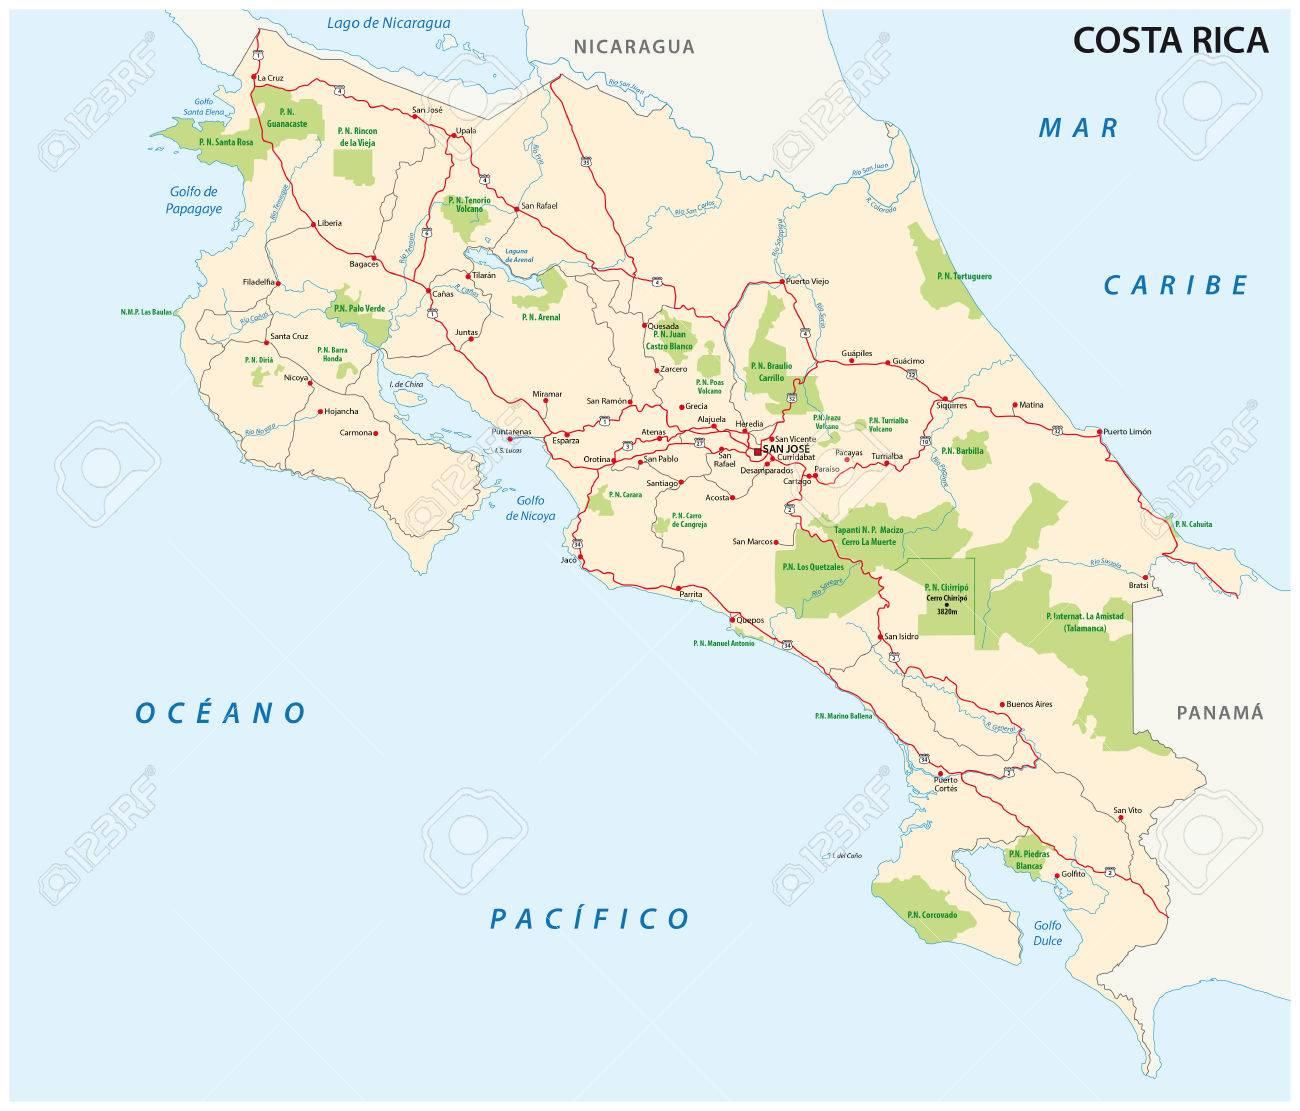 nationalparks costa rica karte Costa Rica Straße Und Nationalpark Karte Lizenzfrei Nutzbare